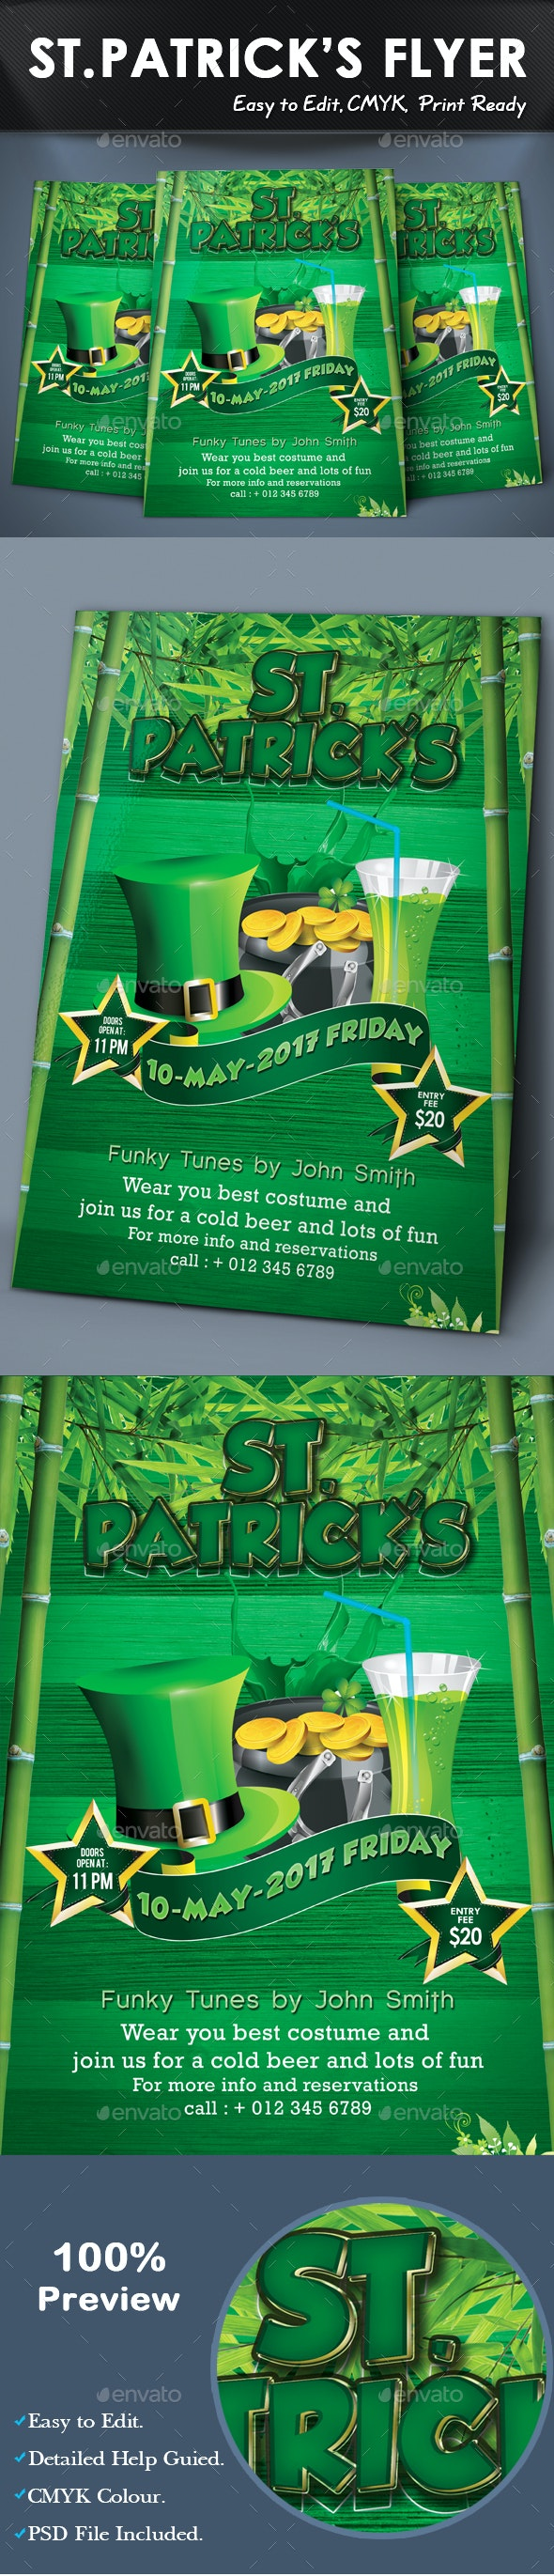 ST. PATRICK'S FLYER TEMPLATE - Flyers Print Templates